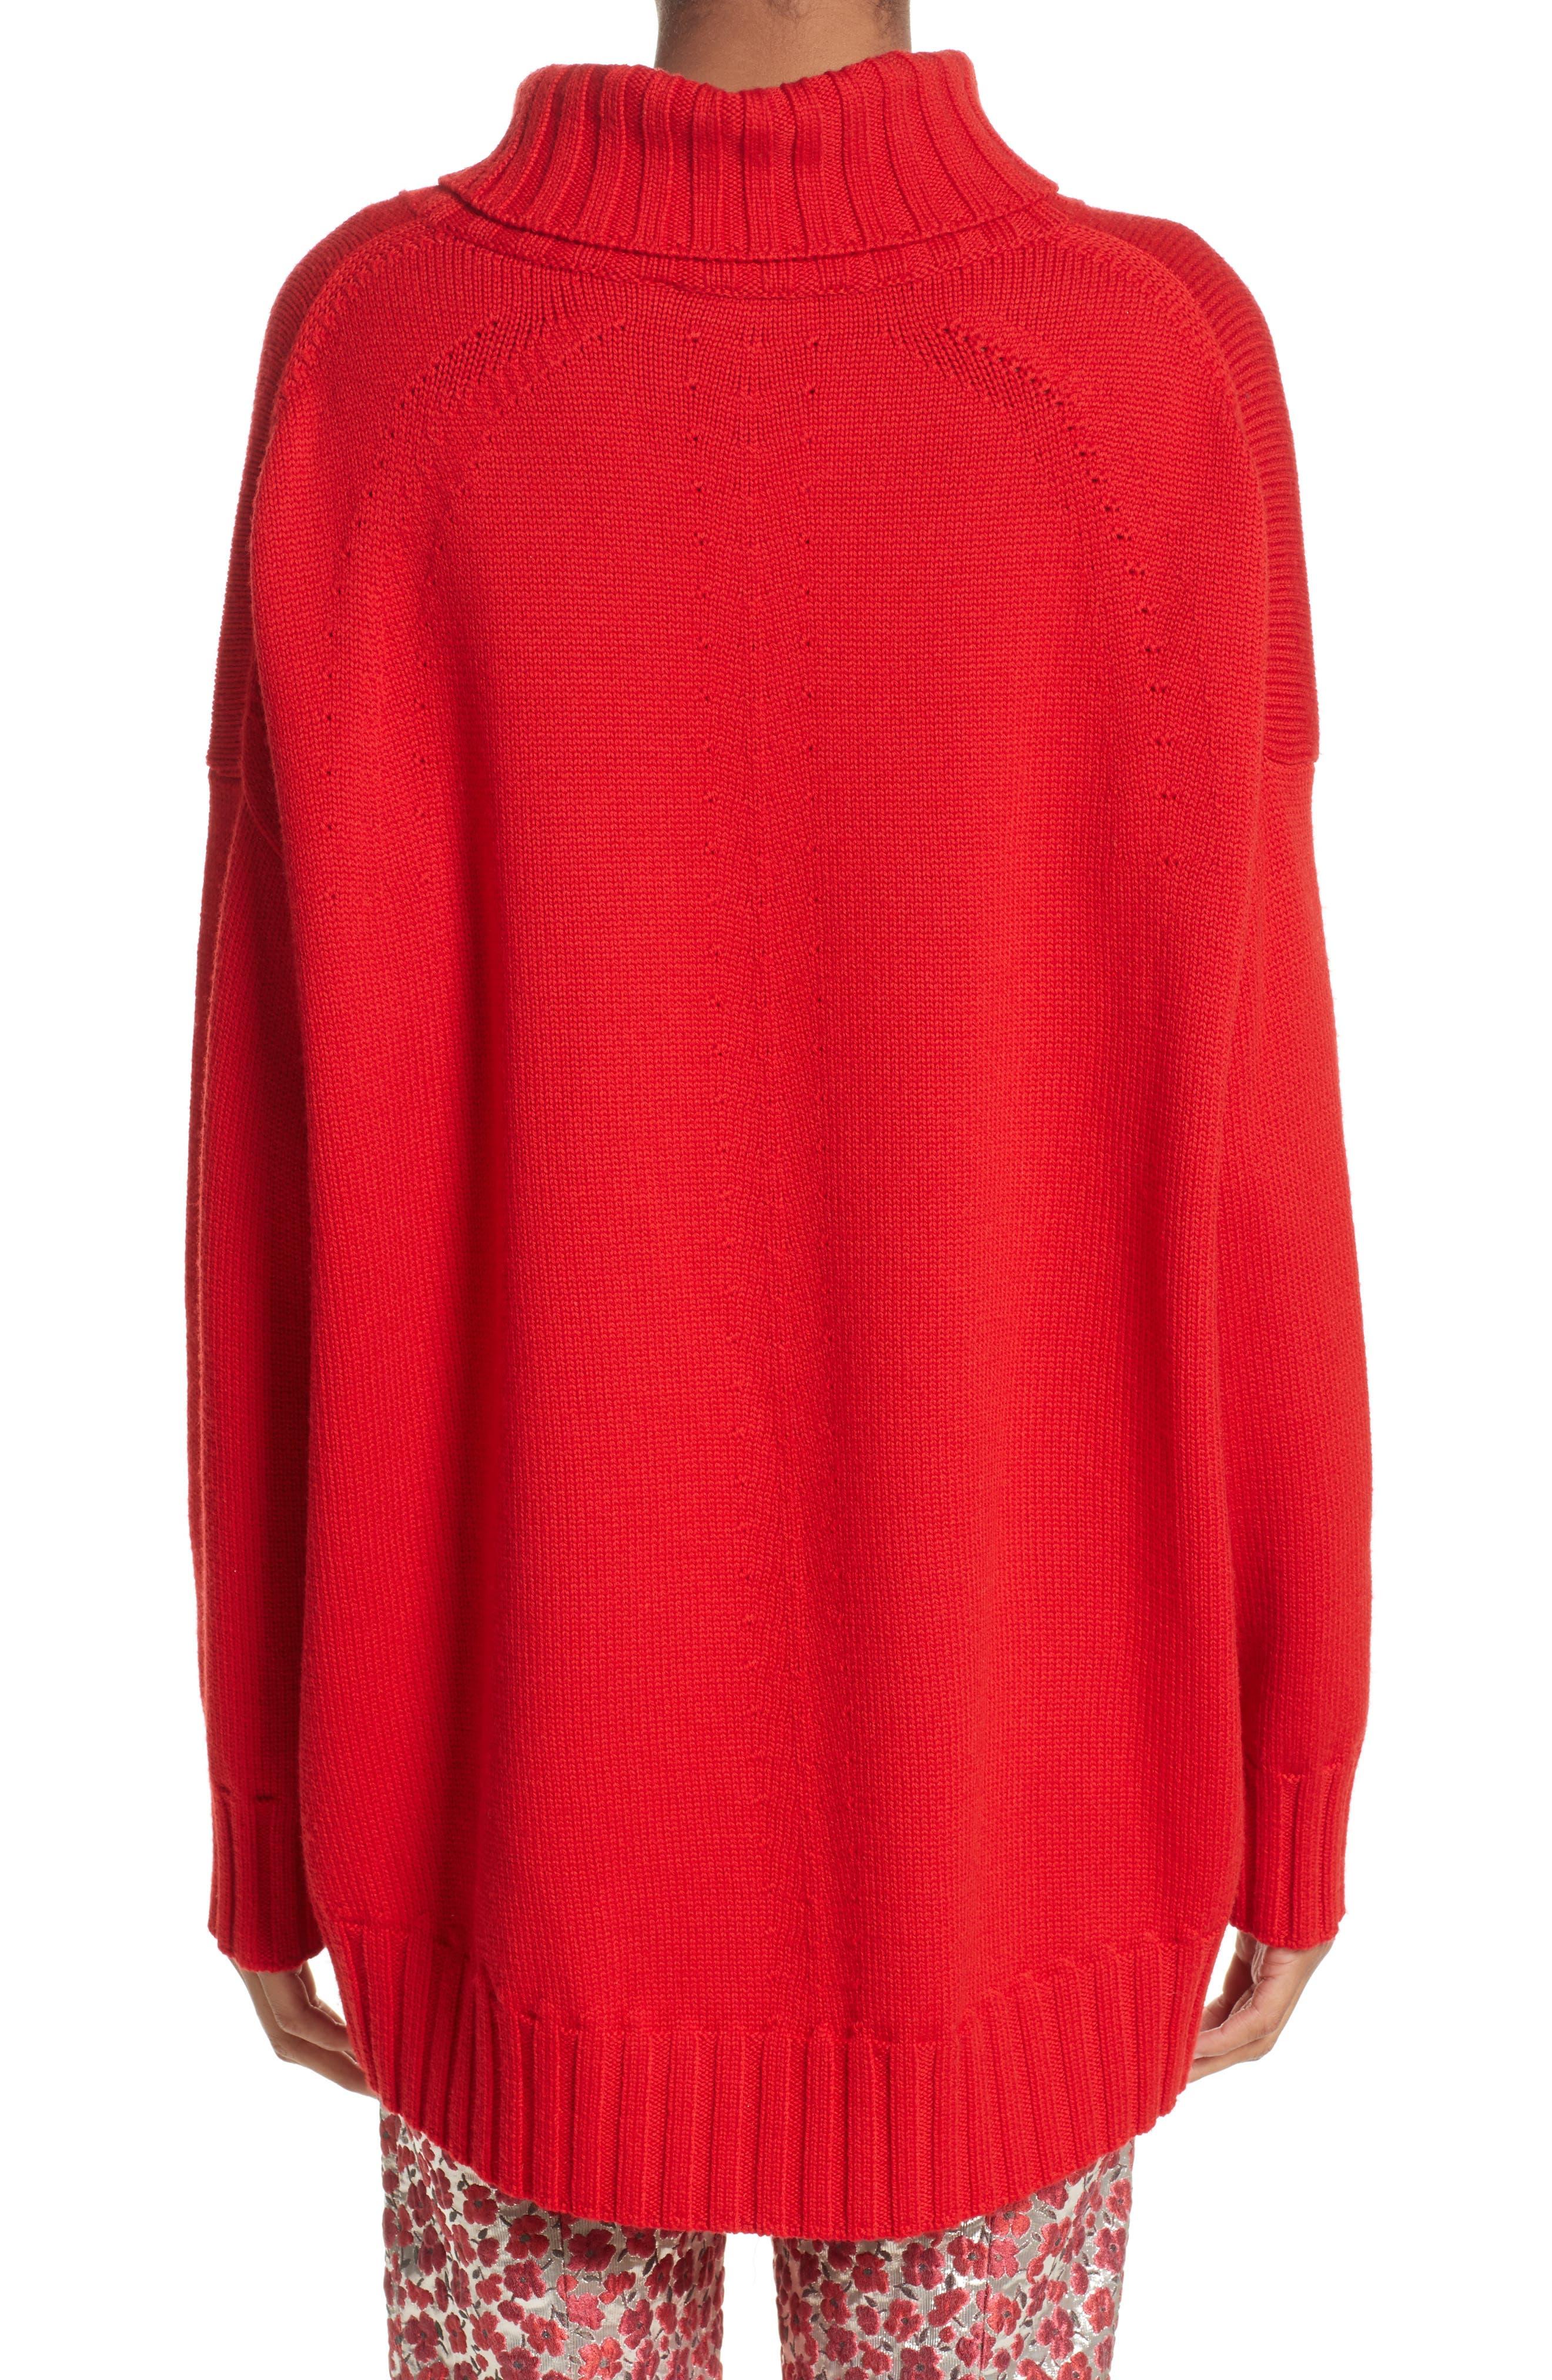 Alternate Image 2  - Oscar de la Renta Virgin Wool Turtleneck Sweater